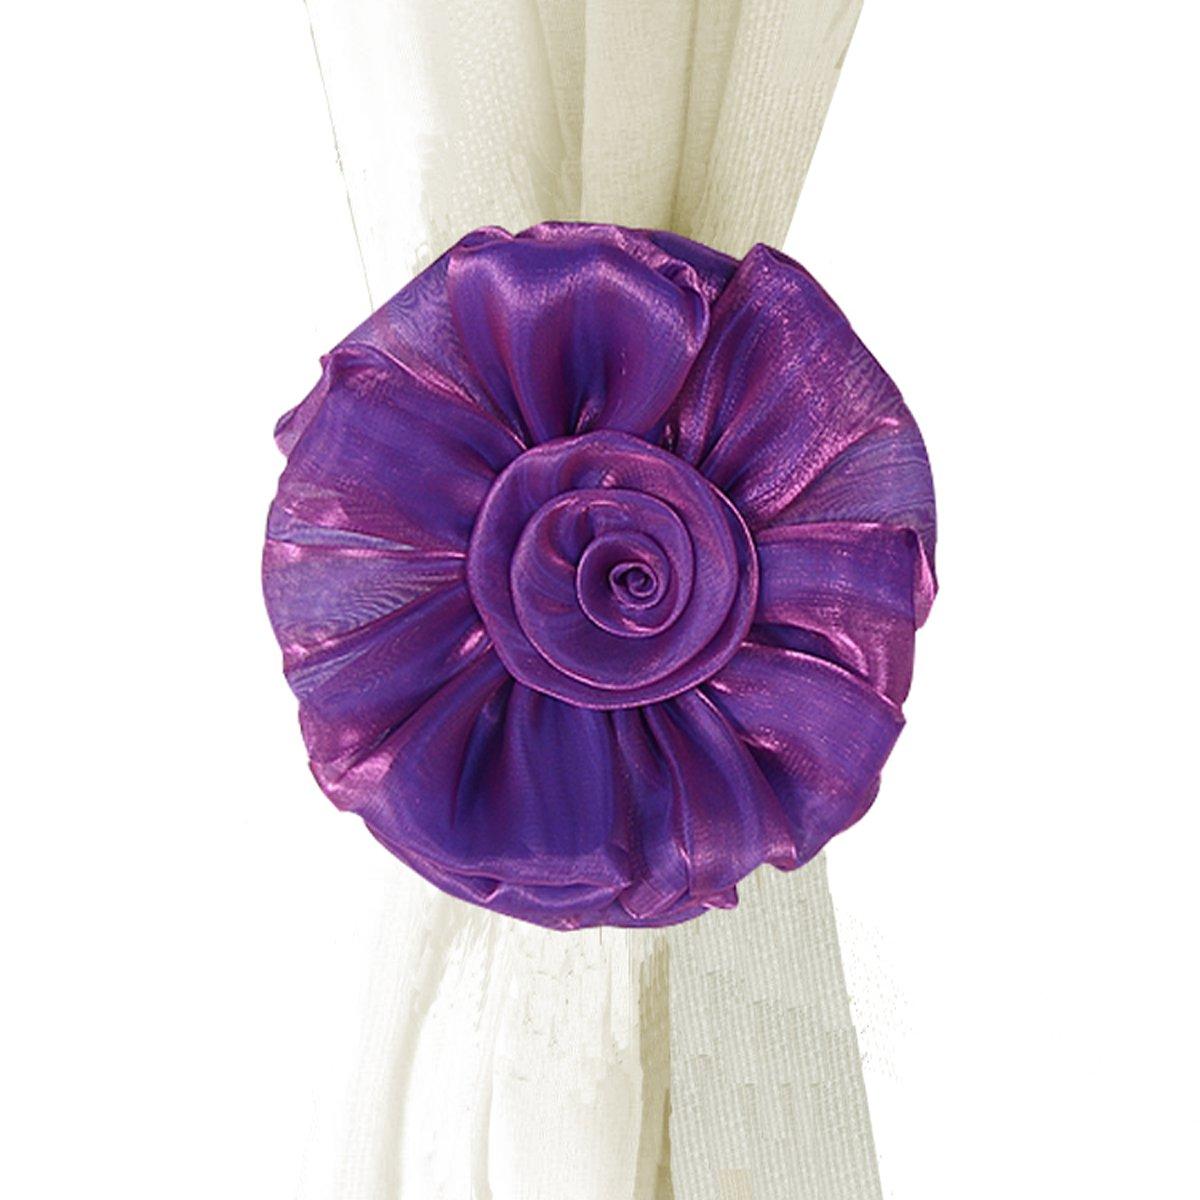 2pcs Cartoon 3D Daisy Flower Window Curtain Tieback Curtain Buckle Accessories for Children Nursery Room (Purple)